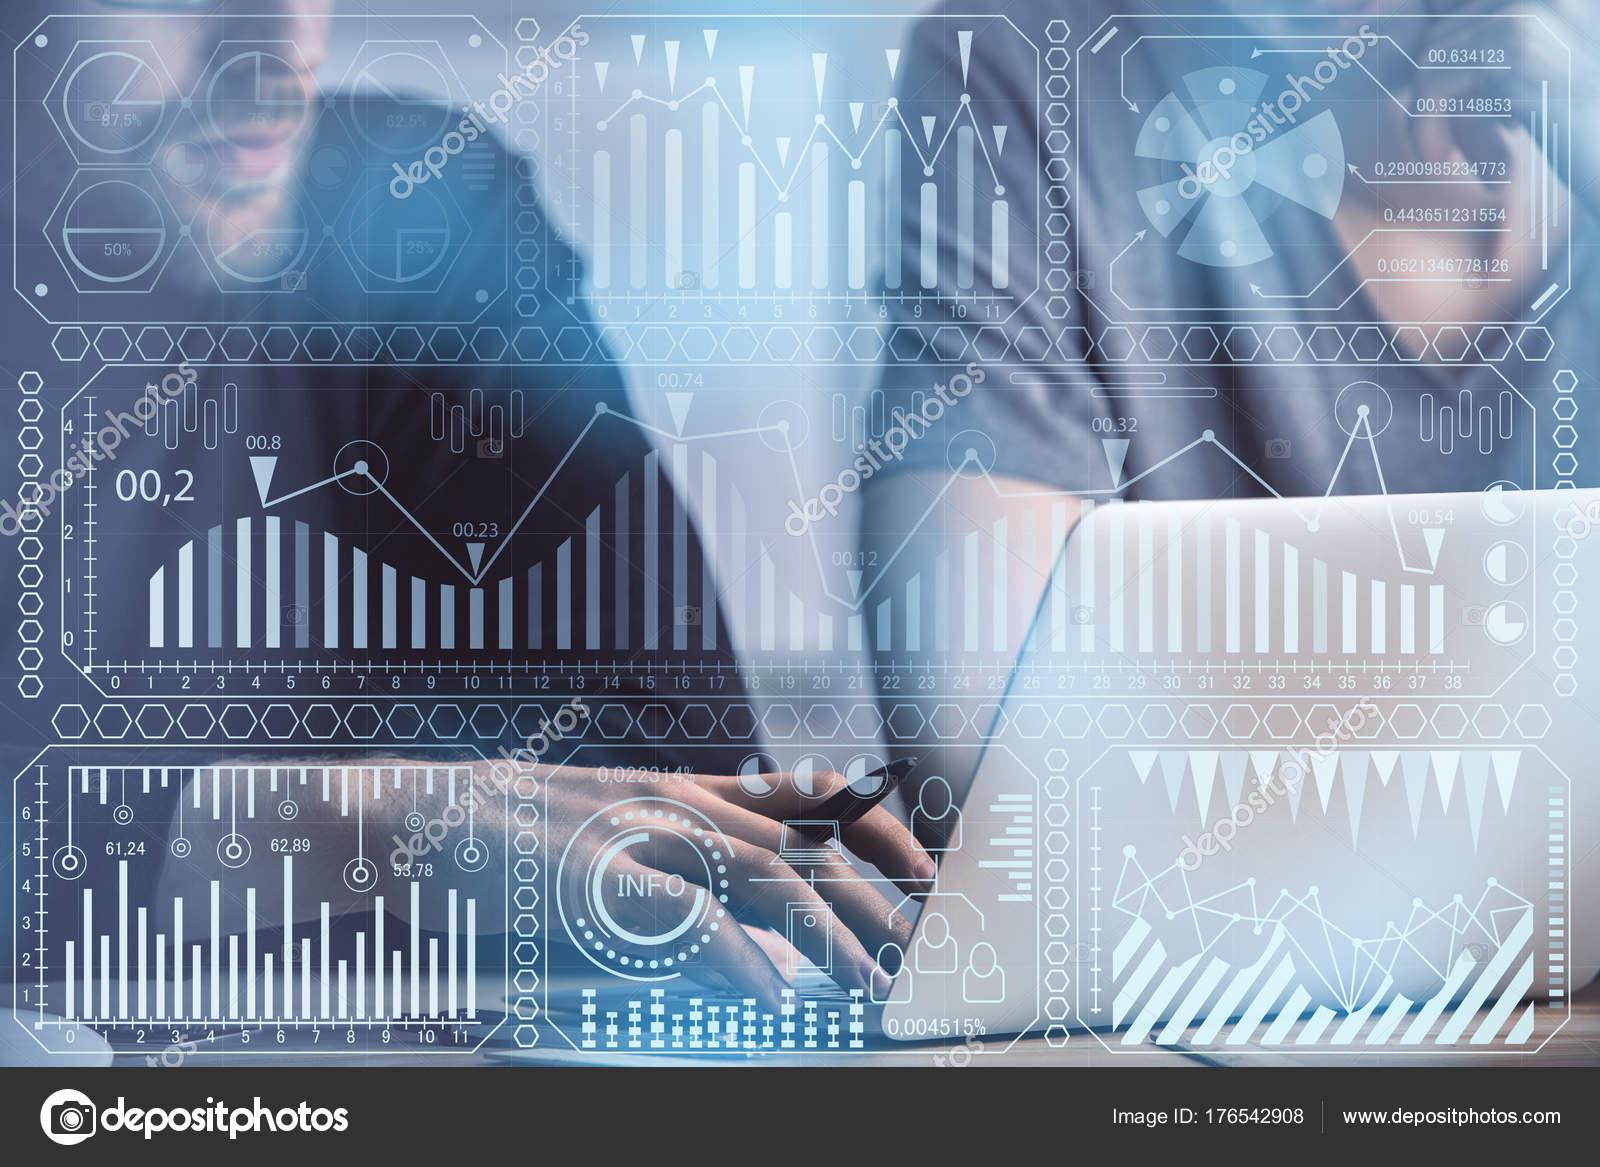 65a853761fa Αγνώριστος επιχειρηματίες χρησιμοποιώντας συσκευή στο χώρο εργασίας με  διεπαφή ψηφιακής επιχείρησης. Επιχείρηση και λογιστική έννοια.